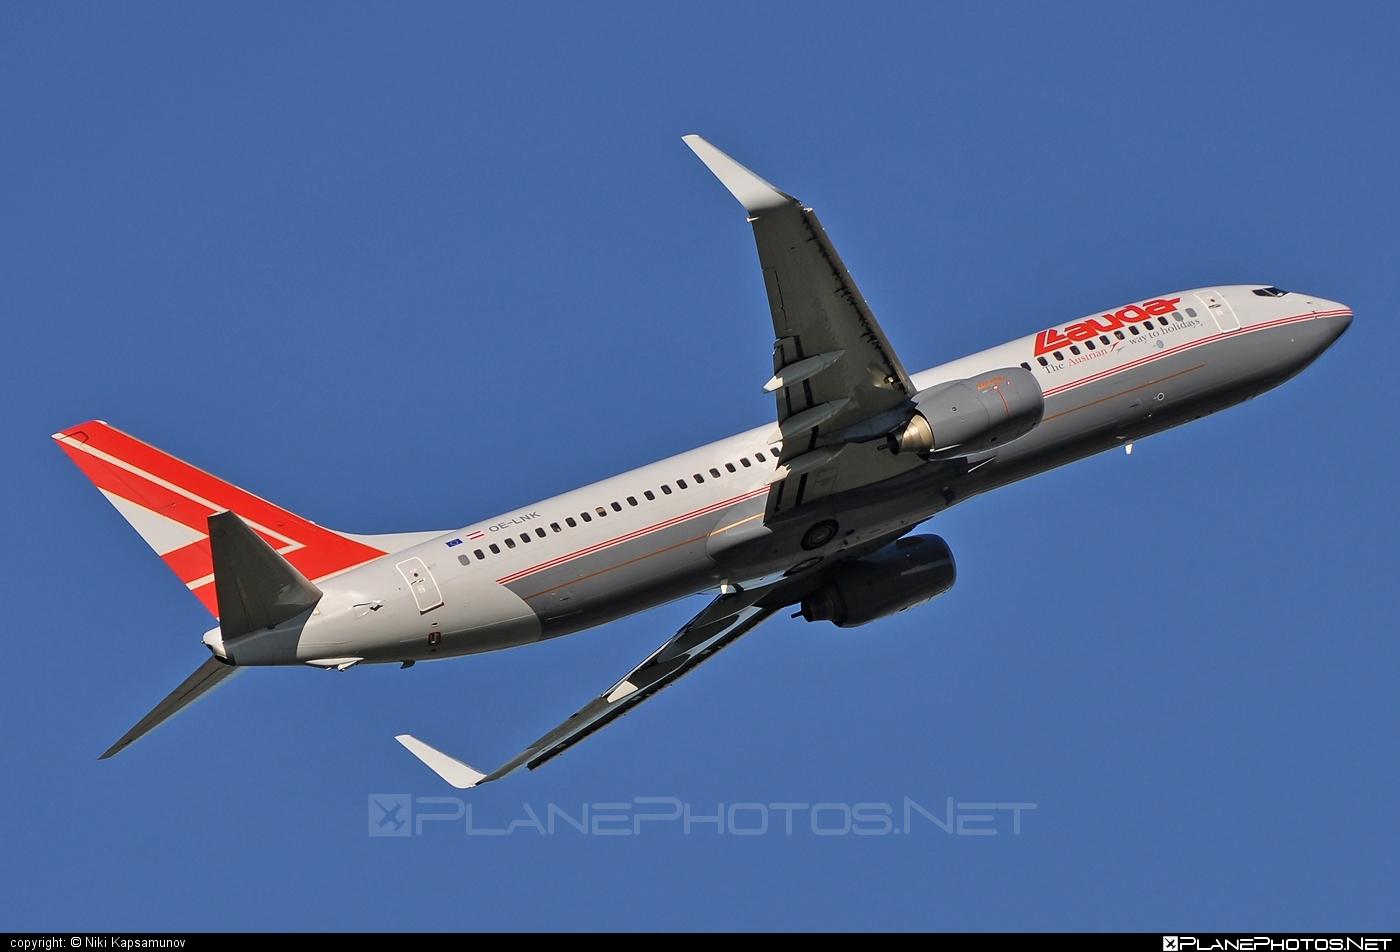 Boeing 737-800 - OE-LNK operated by Lauda Air #b737 #b737nextgen #b737ng #boeing #boeing737